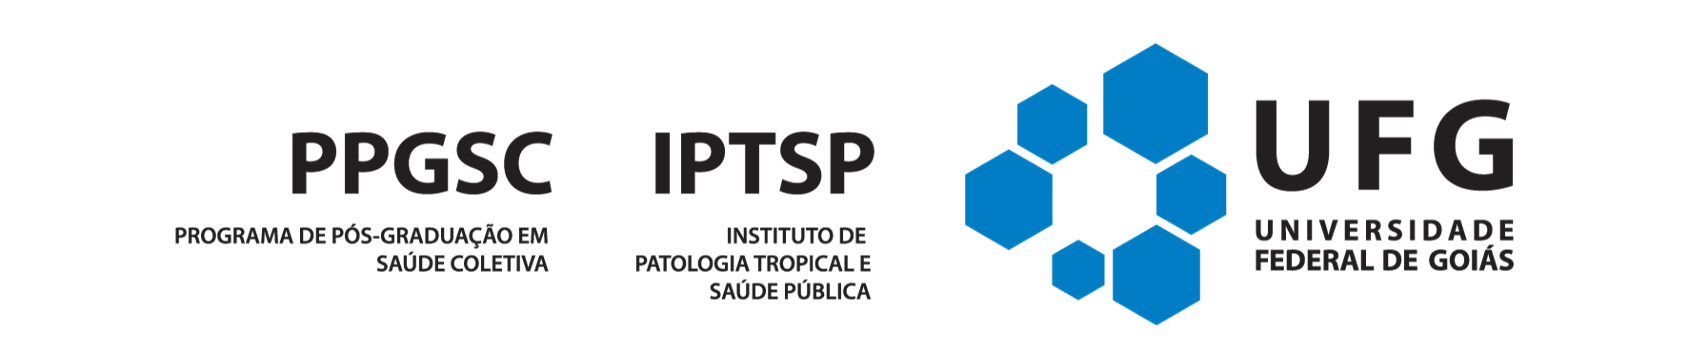 Banner Logo_PPGSC_IPTSP_UFG